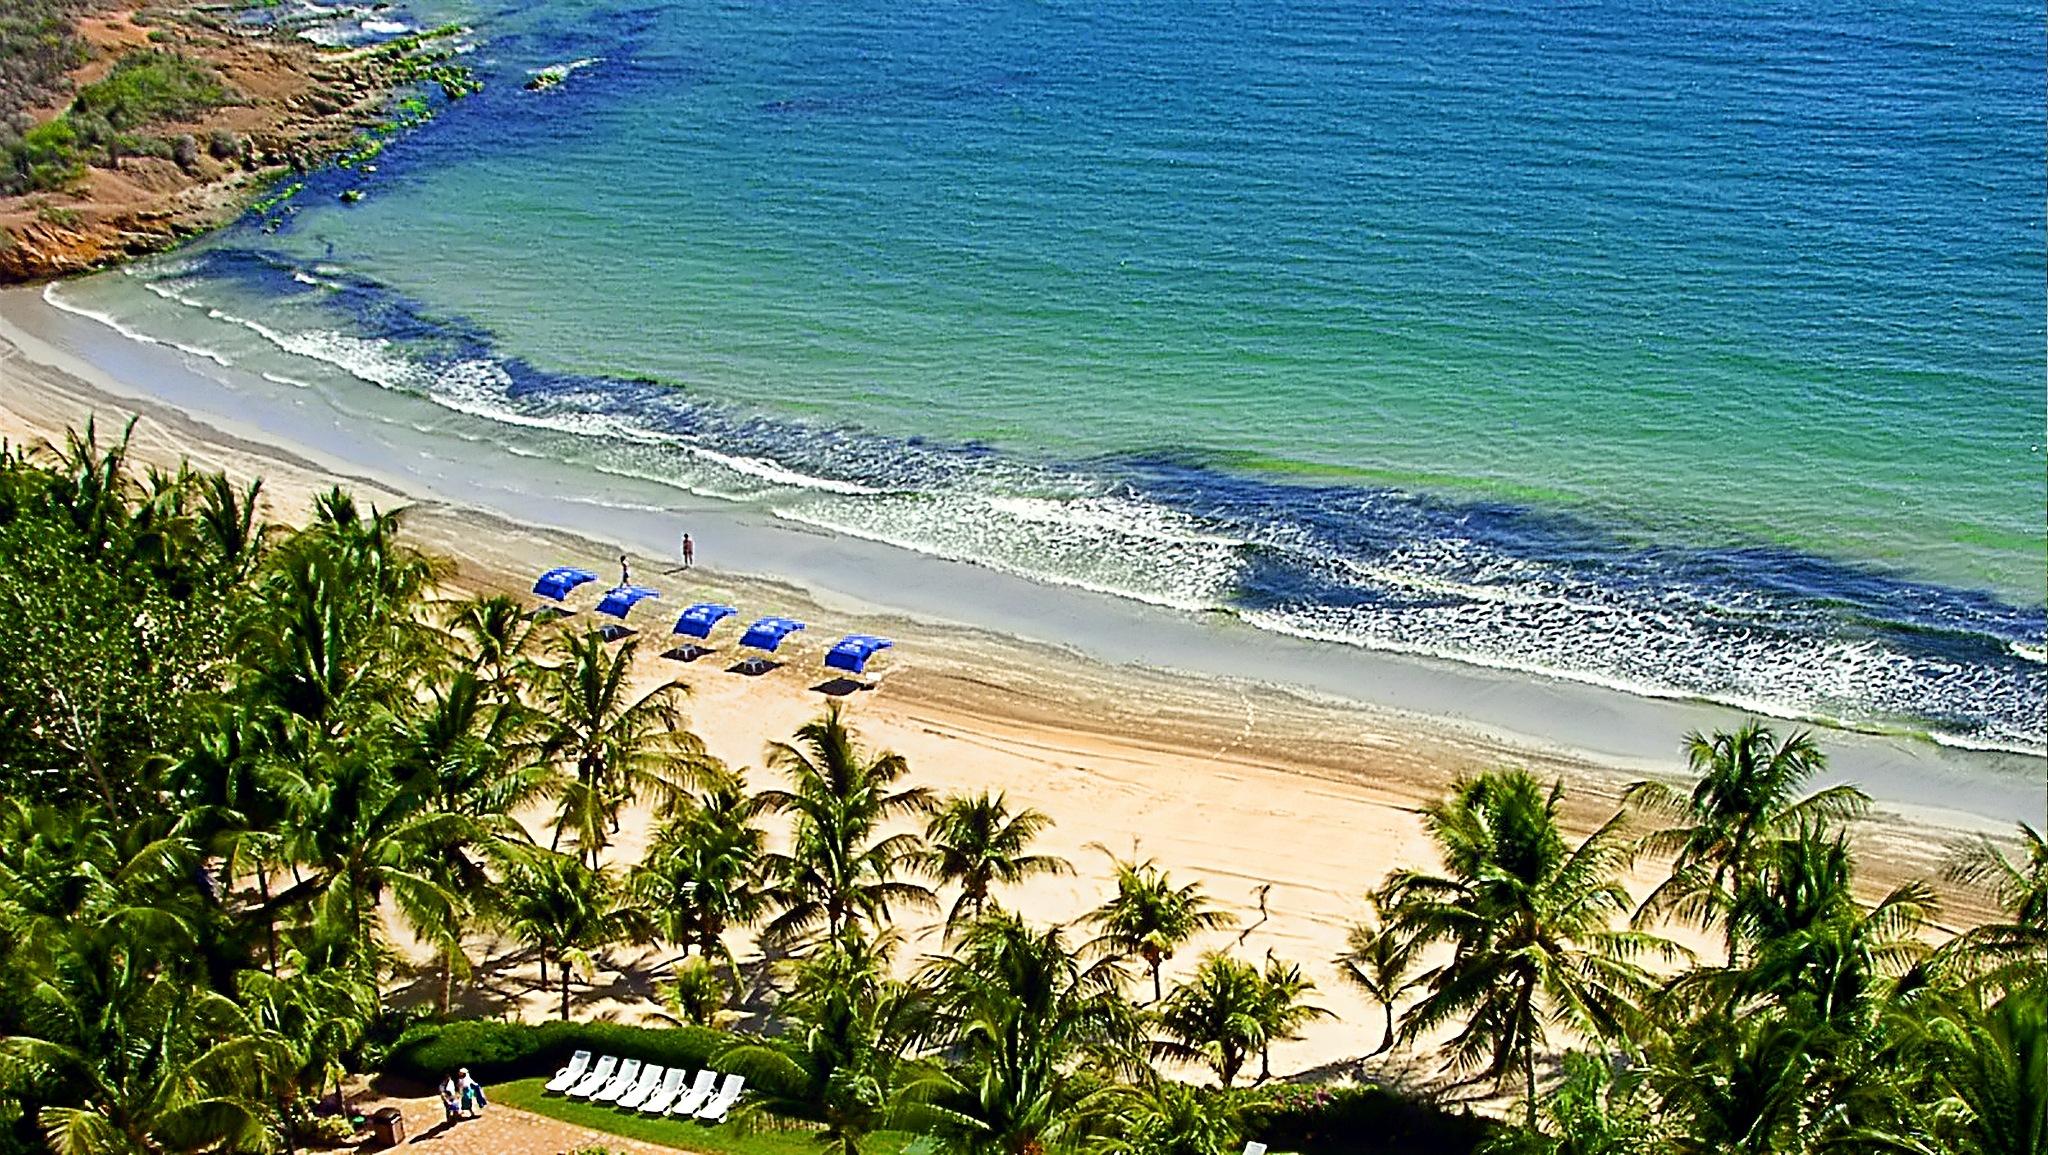 Paisaje marítimo II [La Playa - The Beach] by Juan Manuel